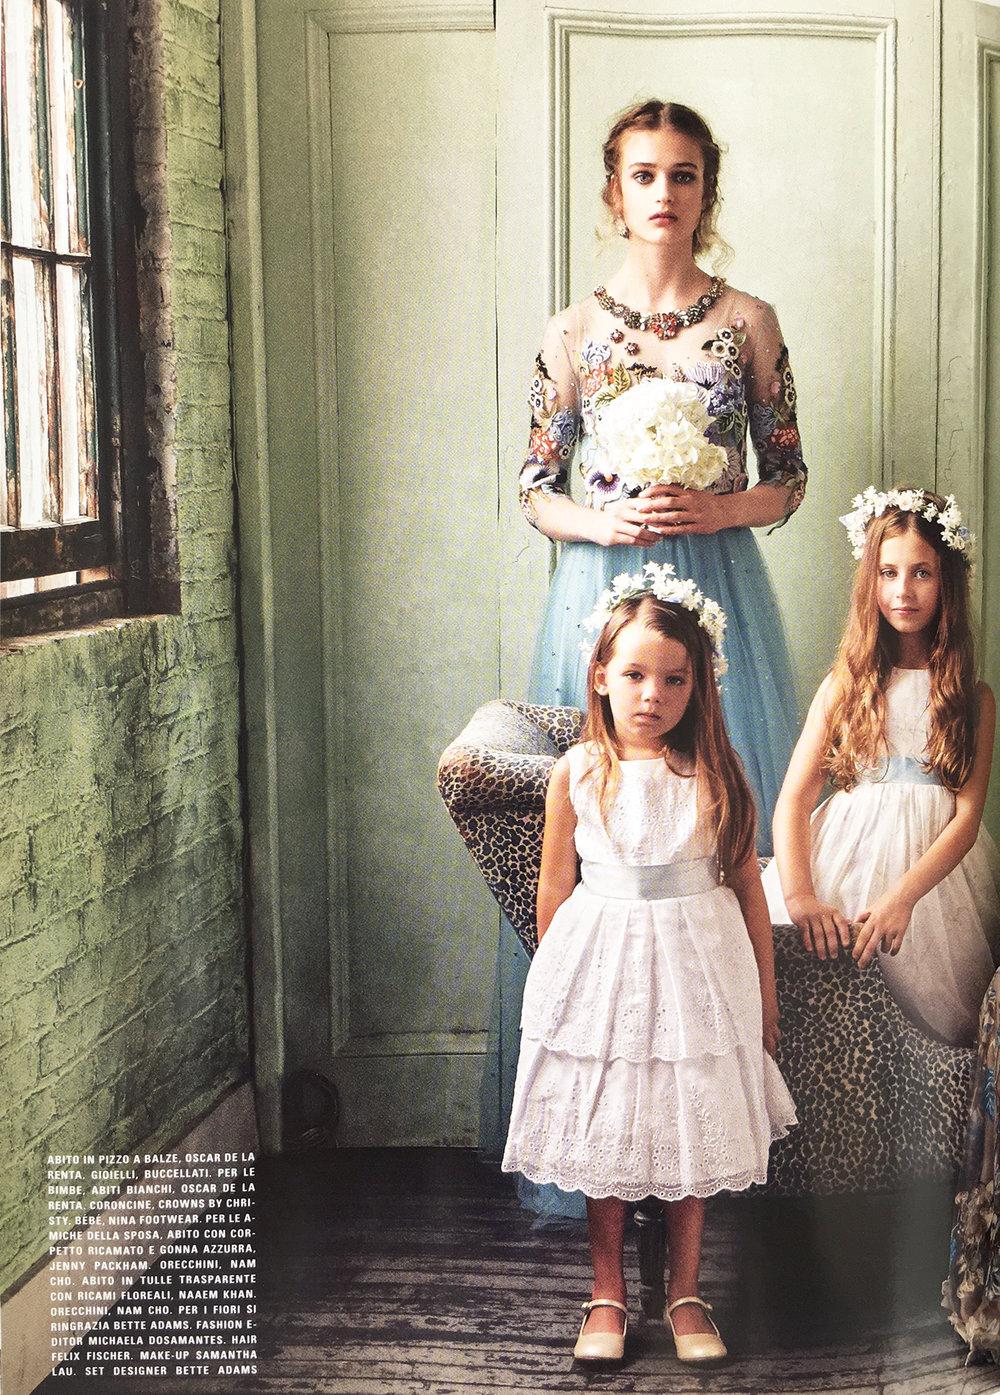 Vogue Sposa - September 2016 #1.jpg